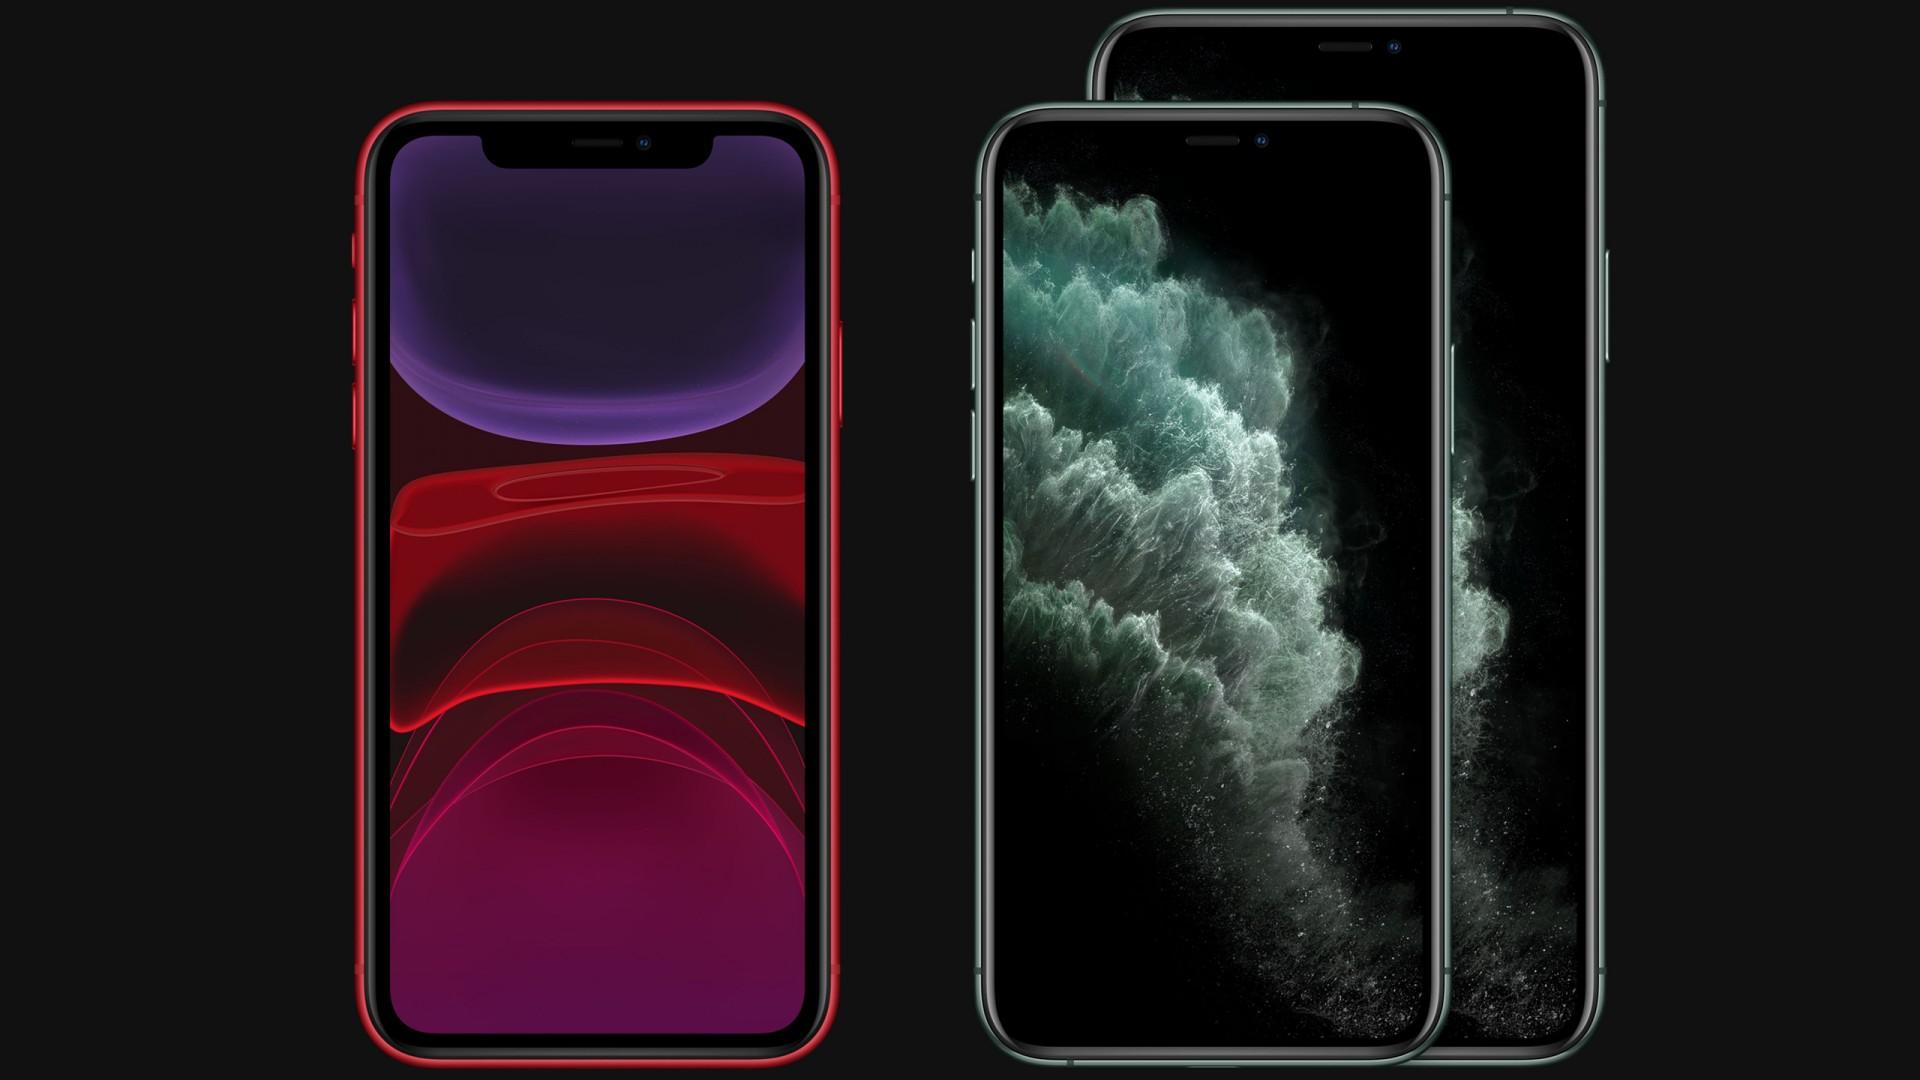 Wallpaper iPhone 11, iPhone 11 Pro, iPhone 11 Pro Max ...